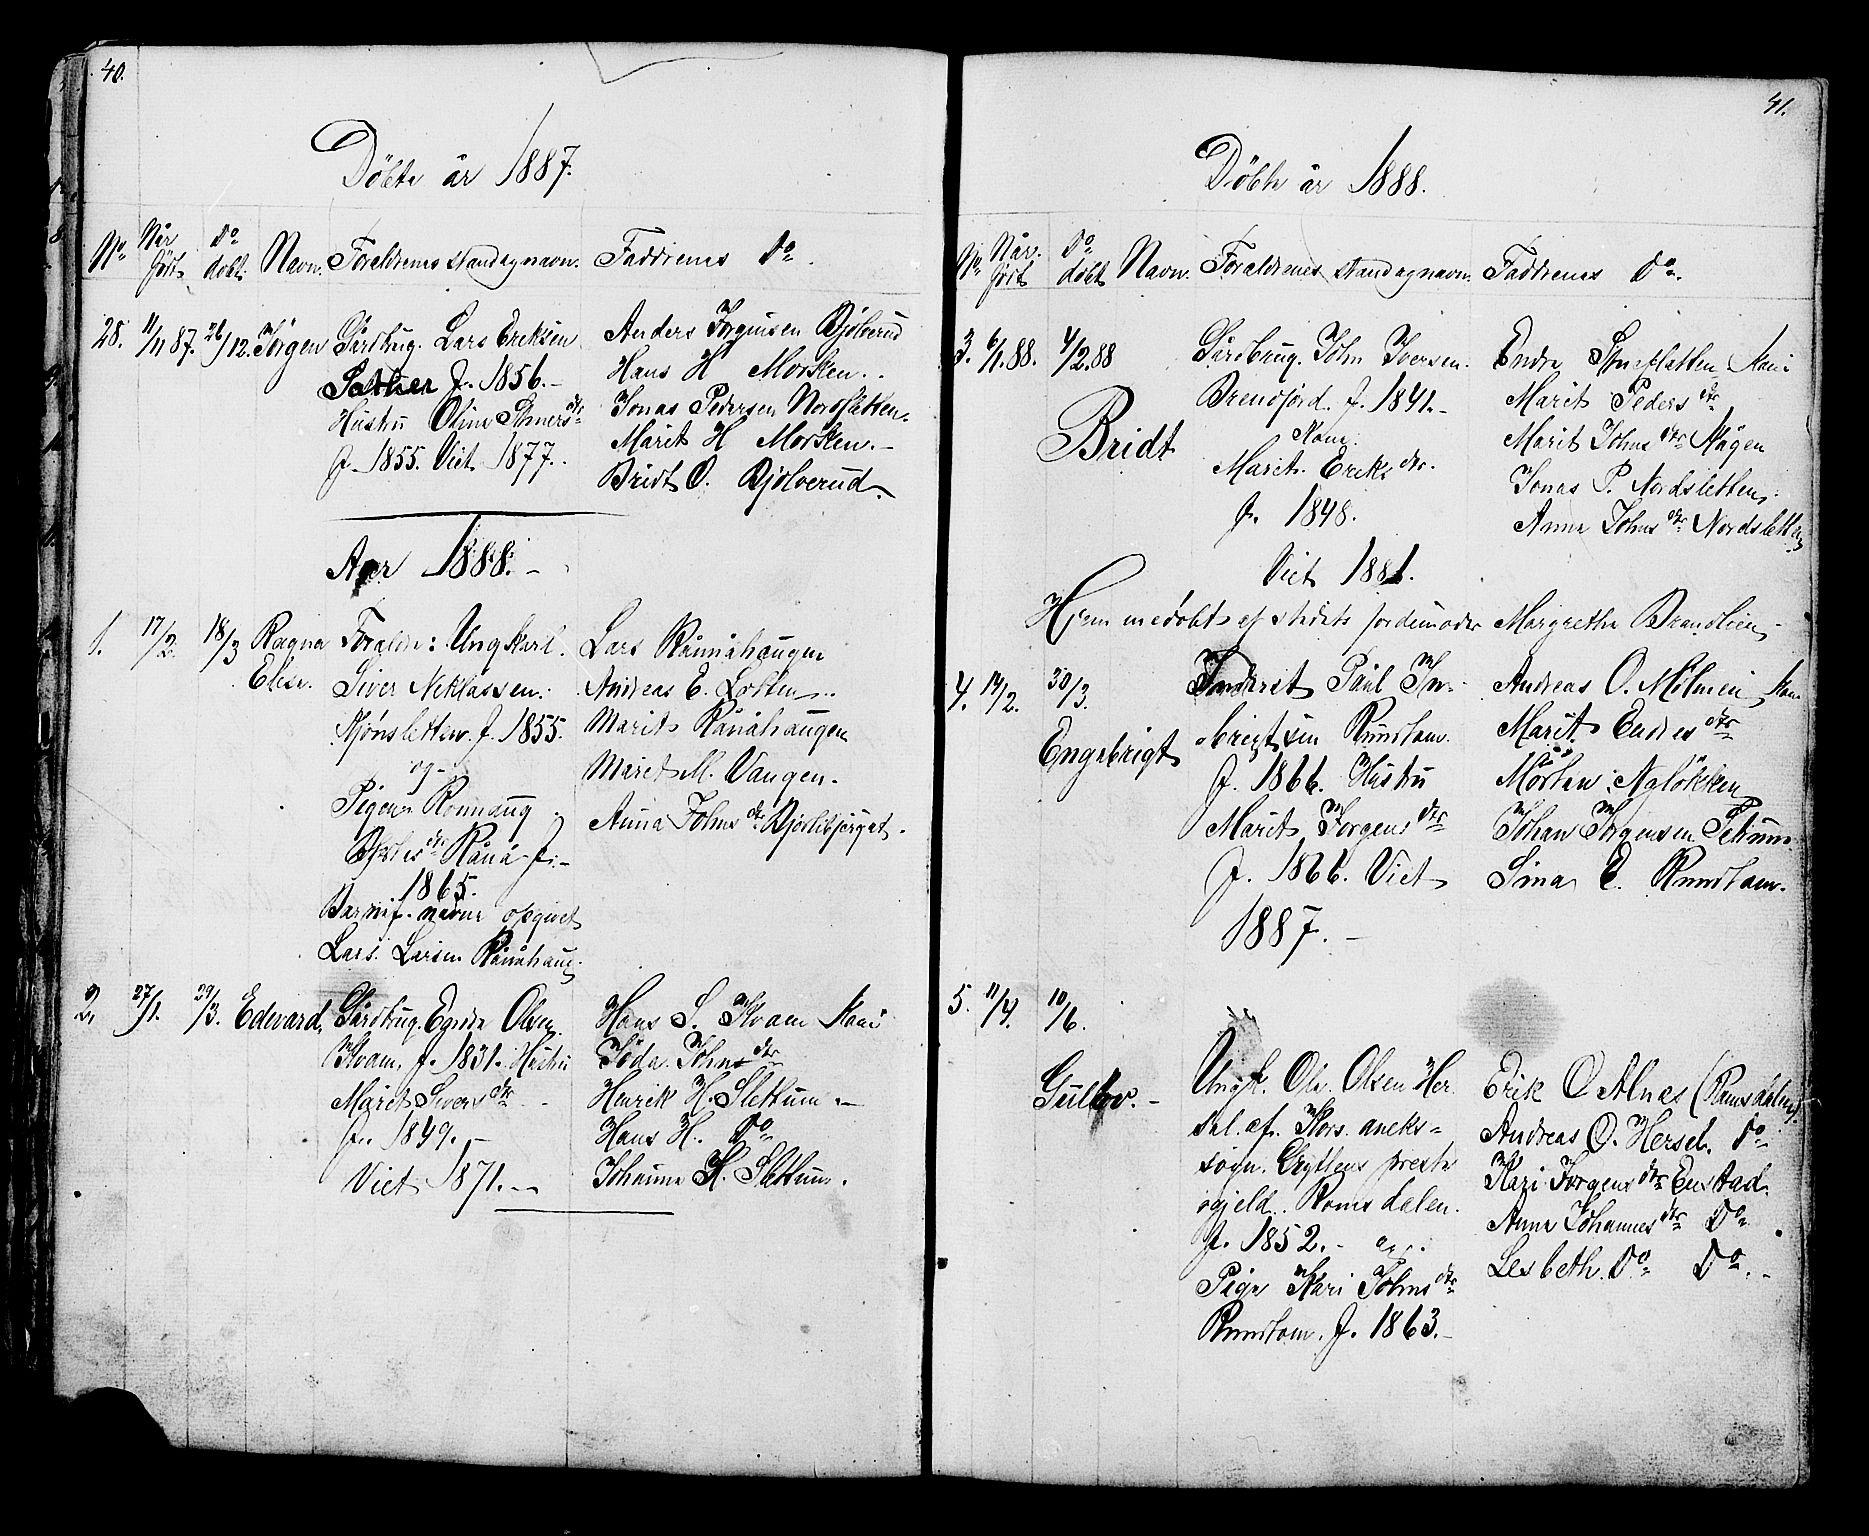 SAH, Lesja prestekontor, Klokkerbok nr. 6, 1871-1904, s. 40-41